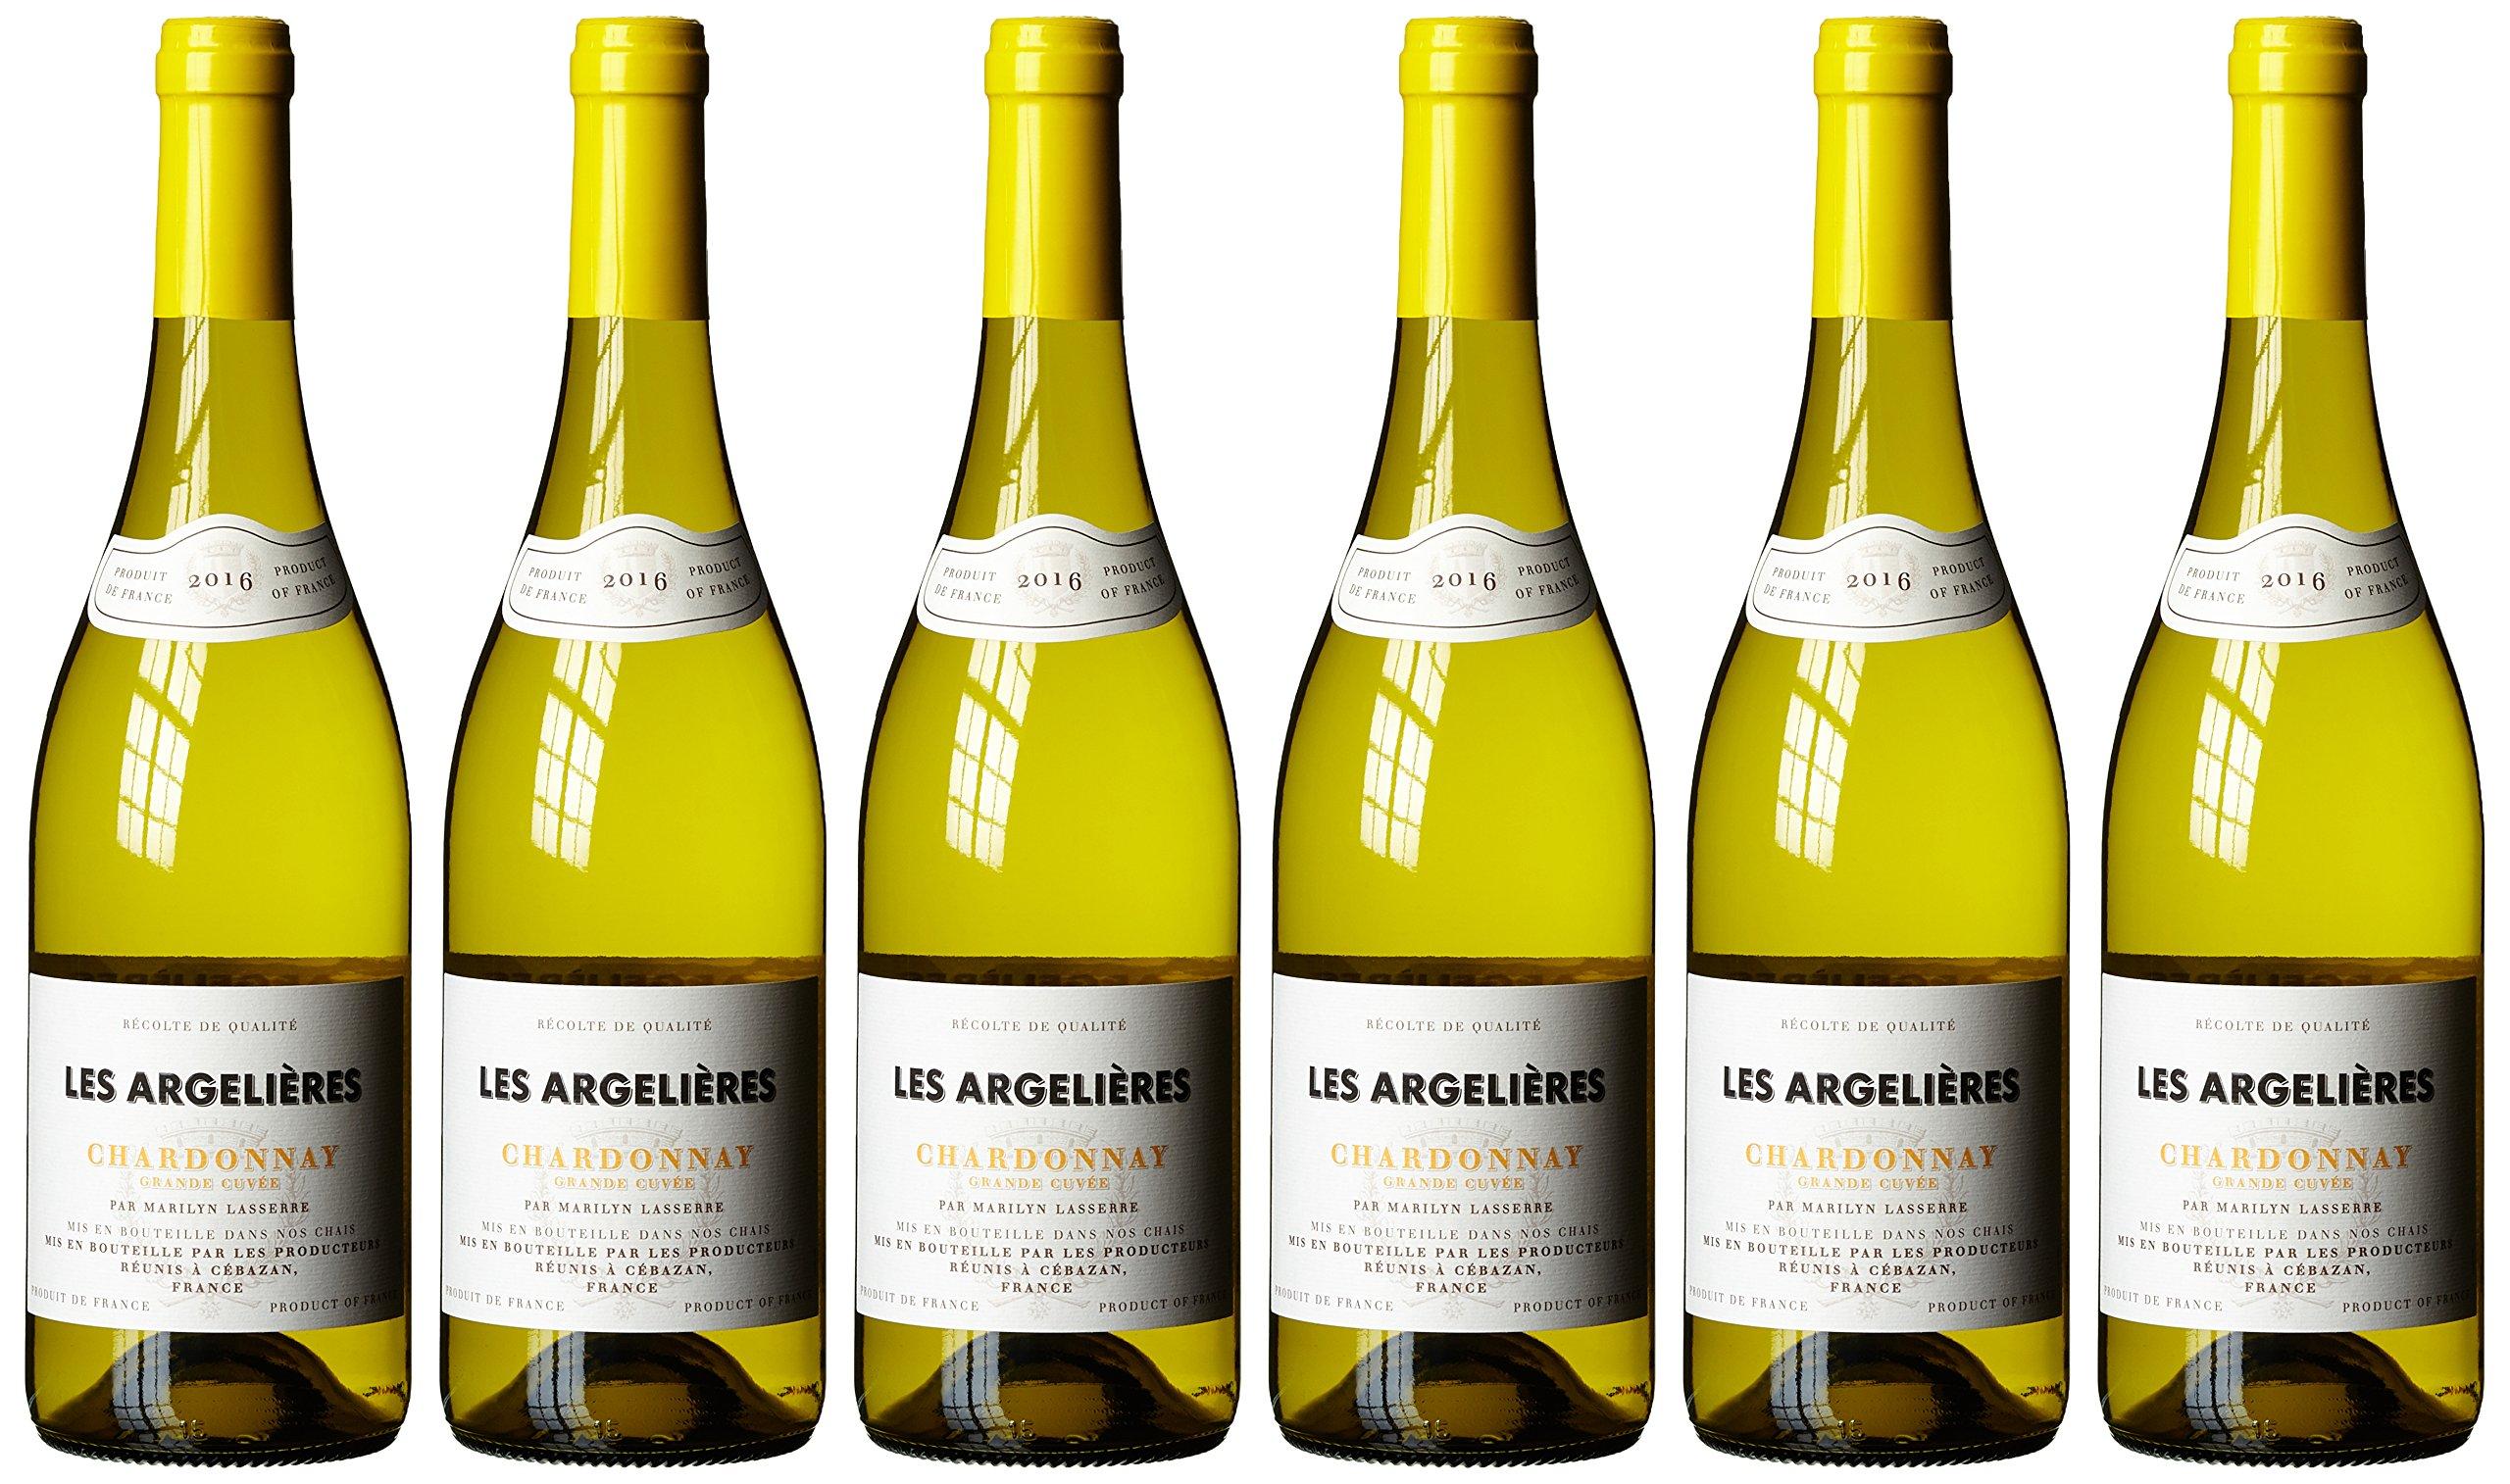 Chardonnay-Les-Argelieres-Chardonnay-2015-trocken-6-x-075-l